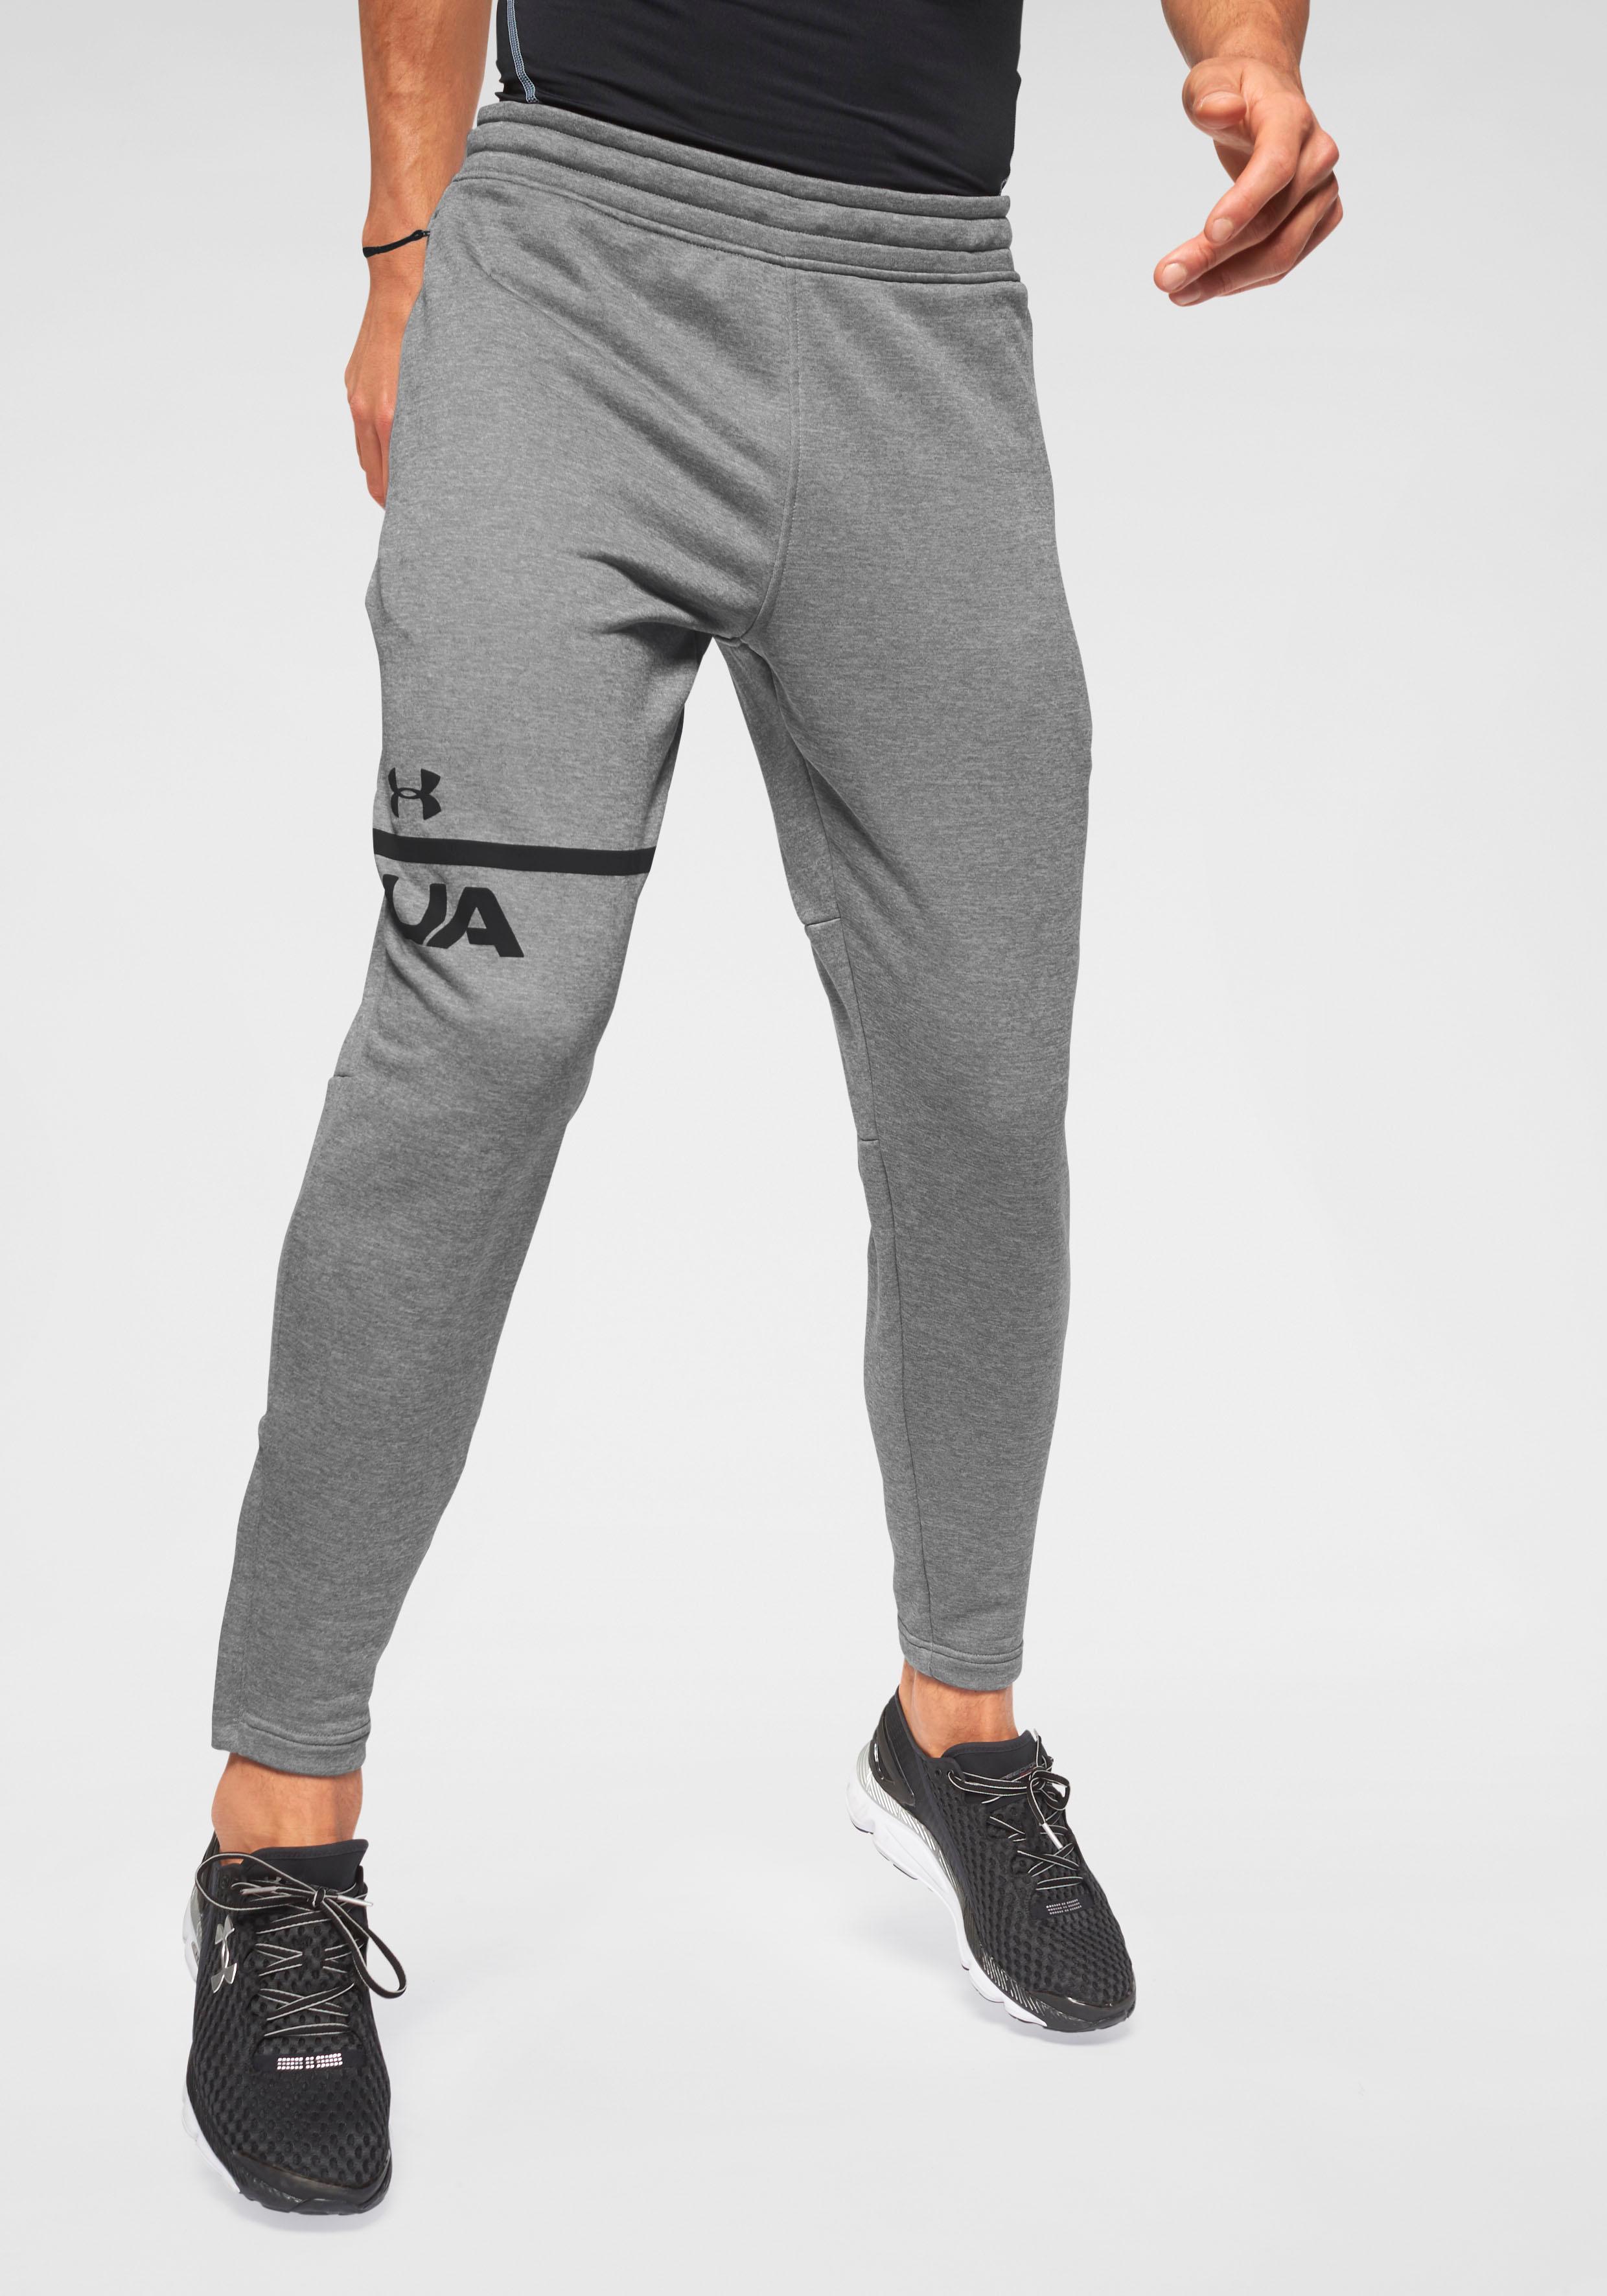 Under Armour Jogginghose MK1 TERRY TAPERED PANT | Sportbekleidung > Sporthosen > Jogginghosen | Grau | Under Armour